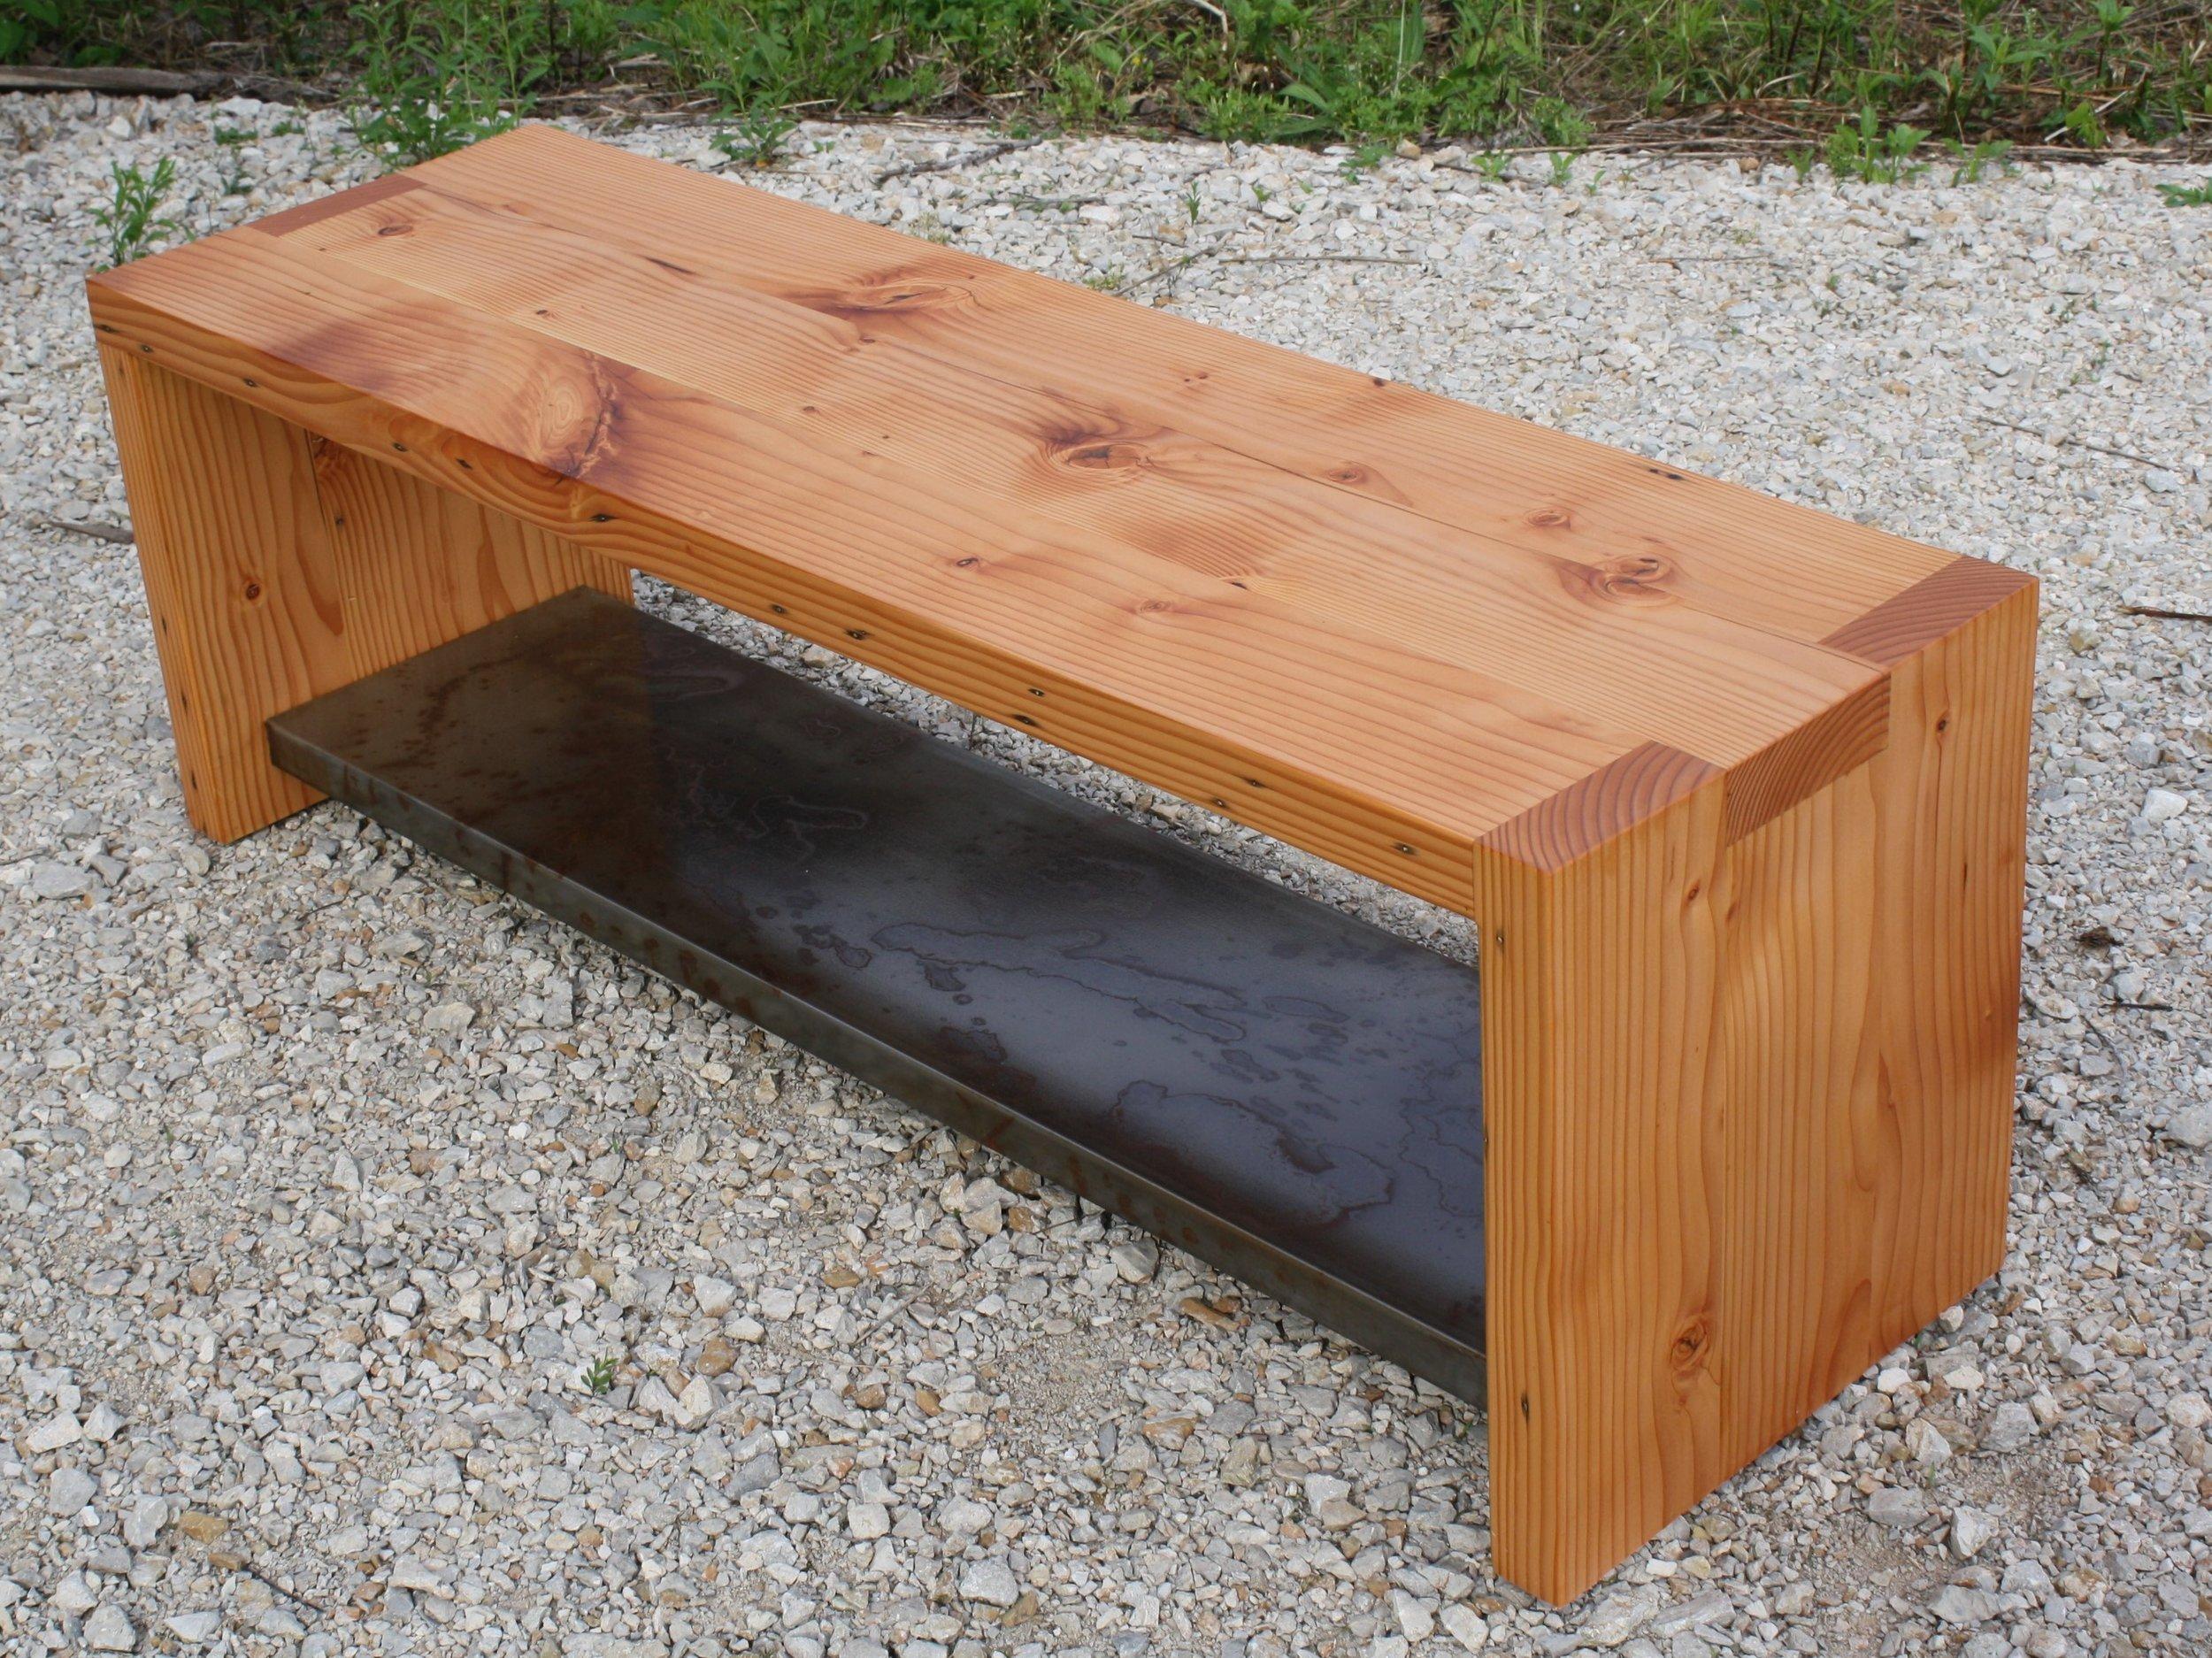 Douglas Fir Box Joint Coffee Table.jpg